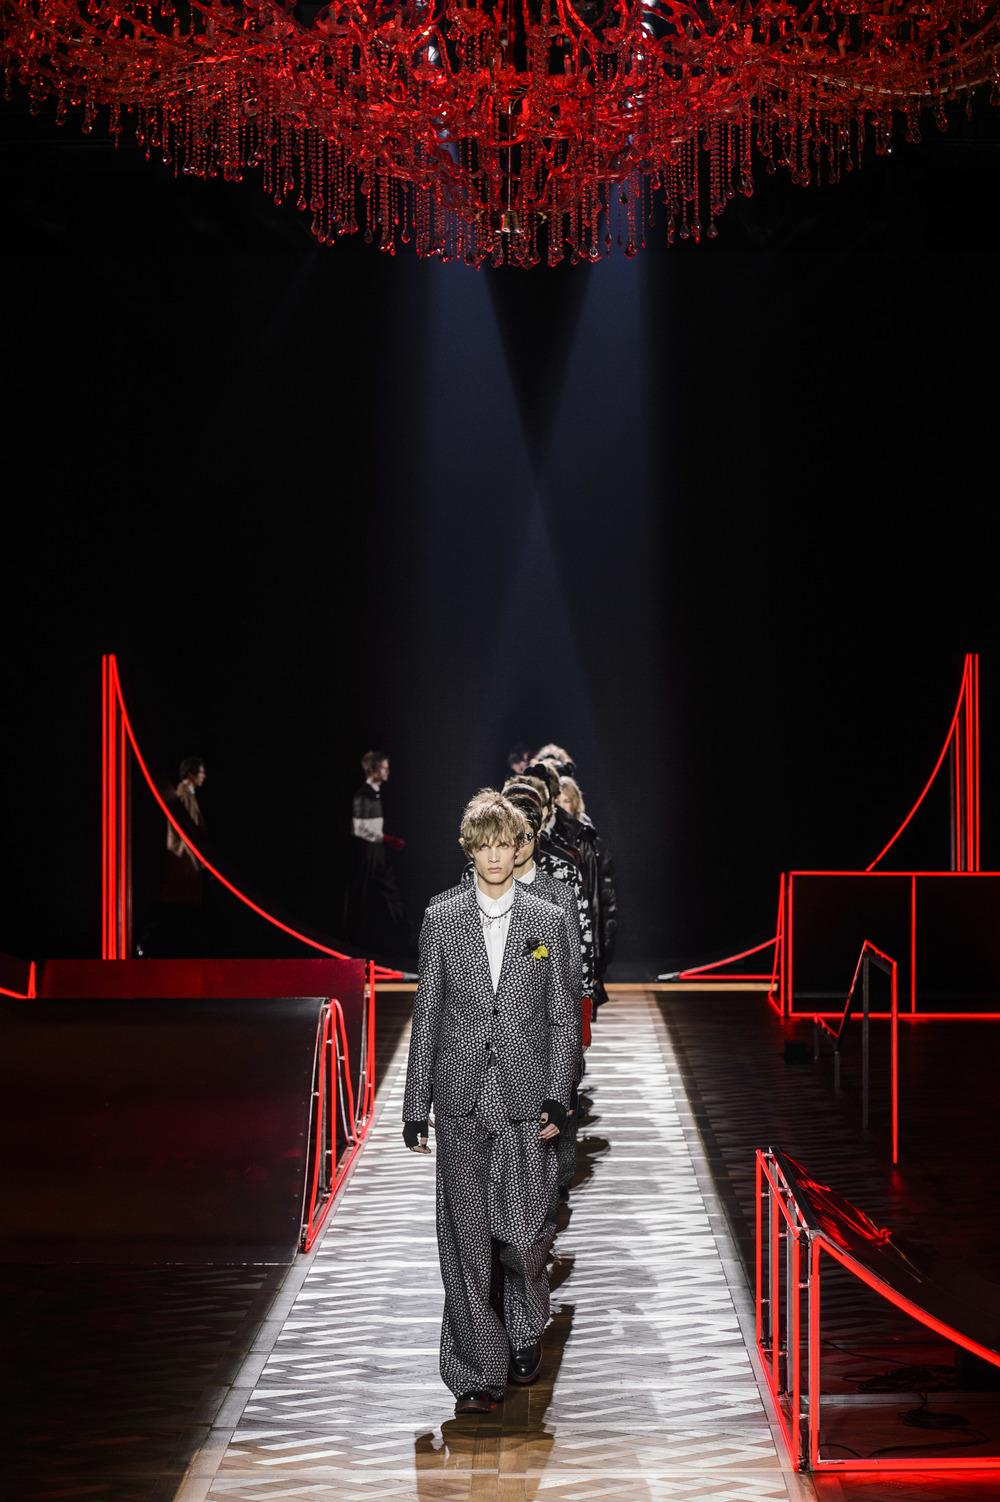 Dior_Homme_Hiver2016-17_look_51.JPG